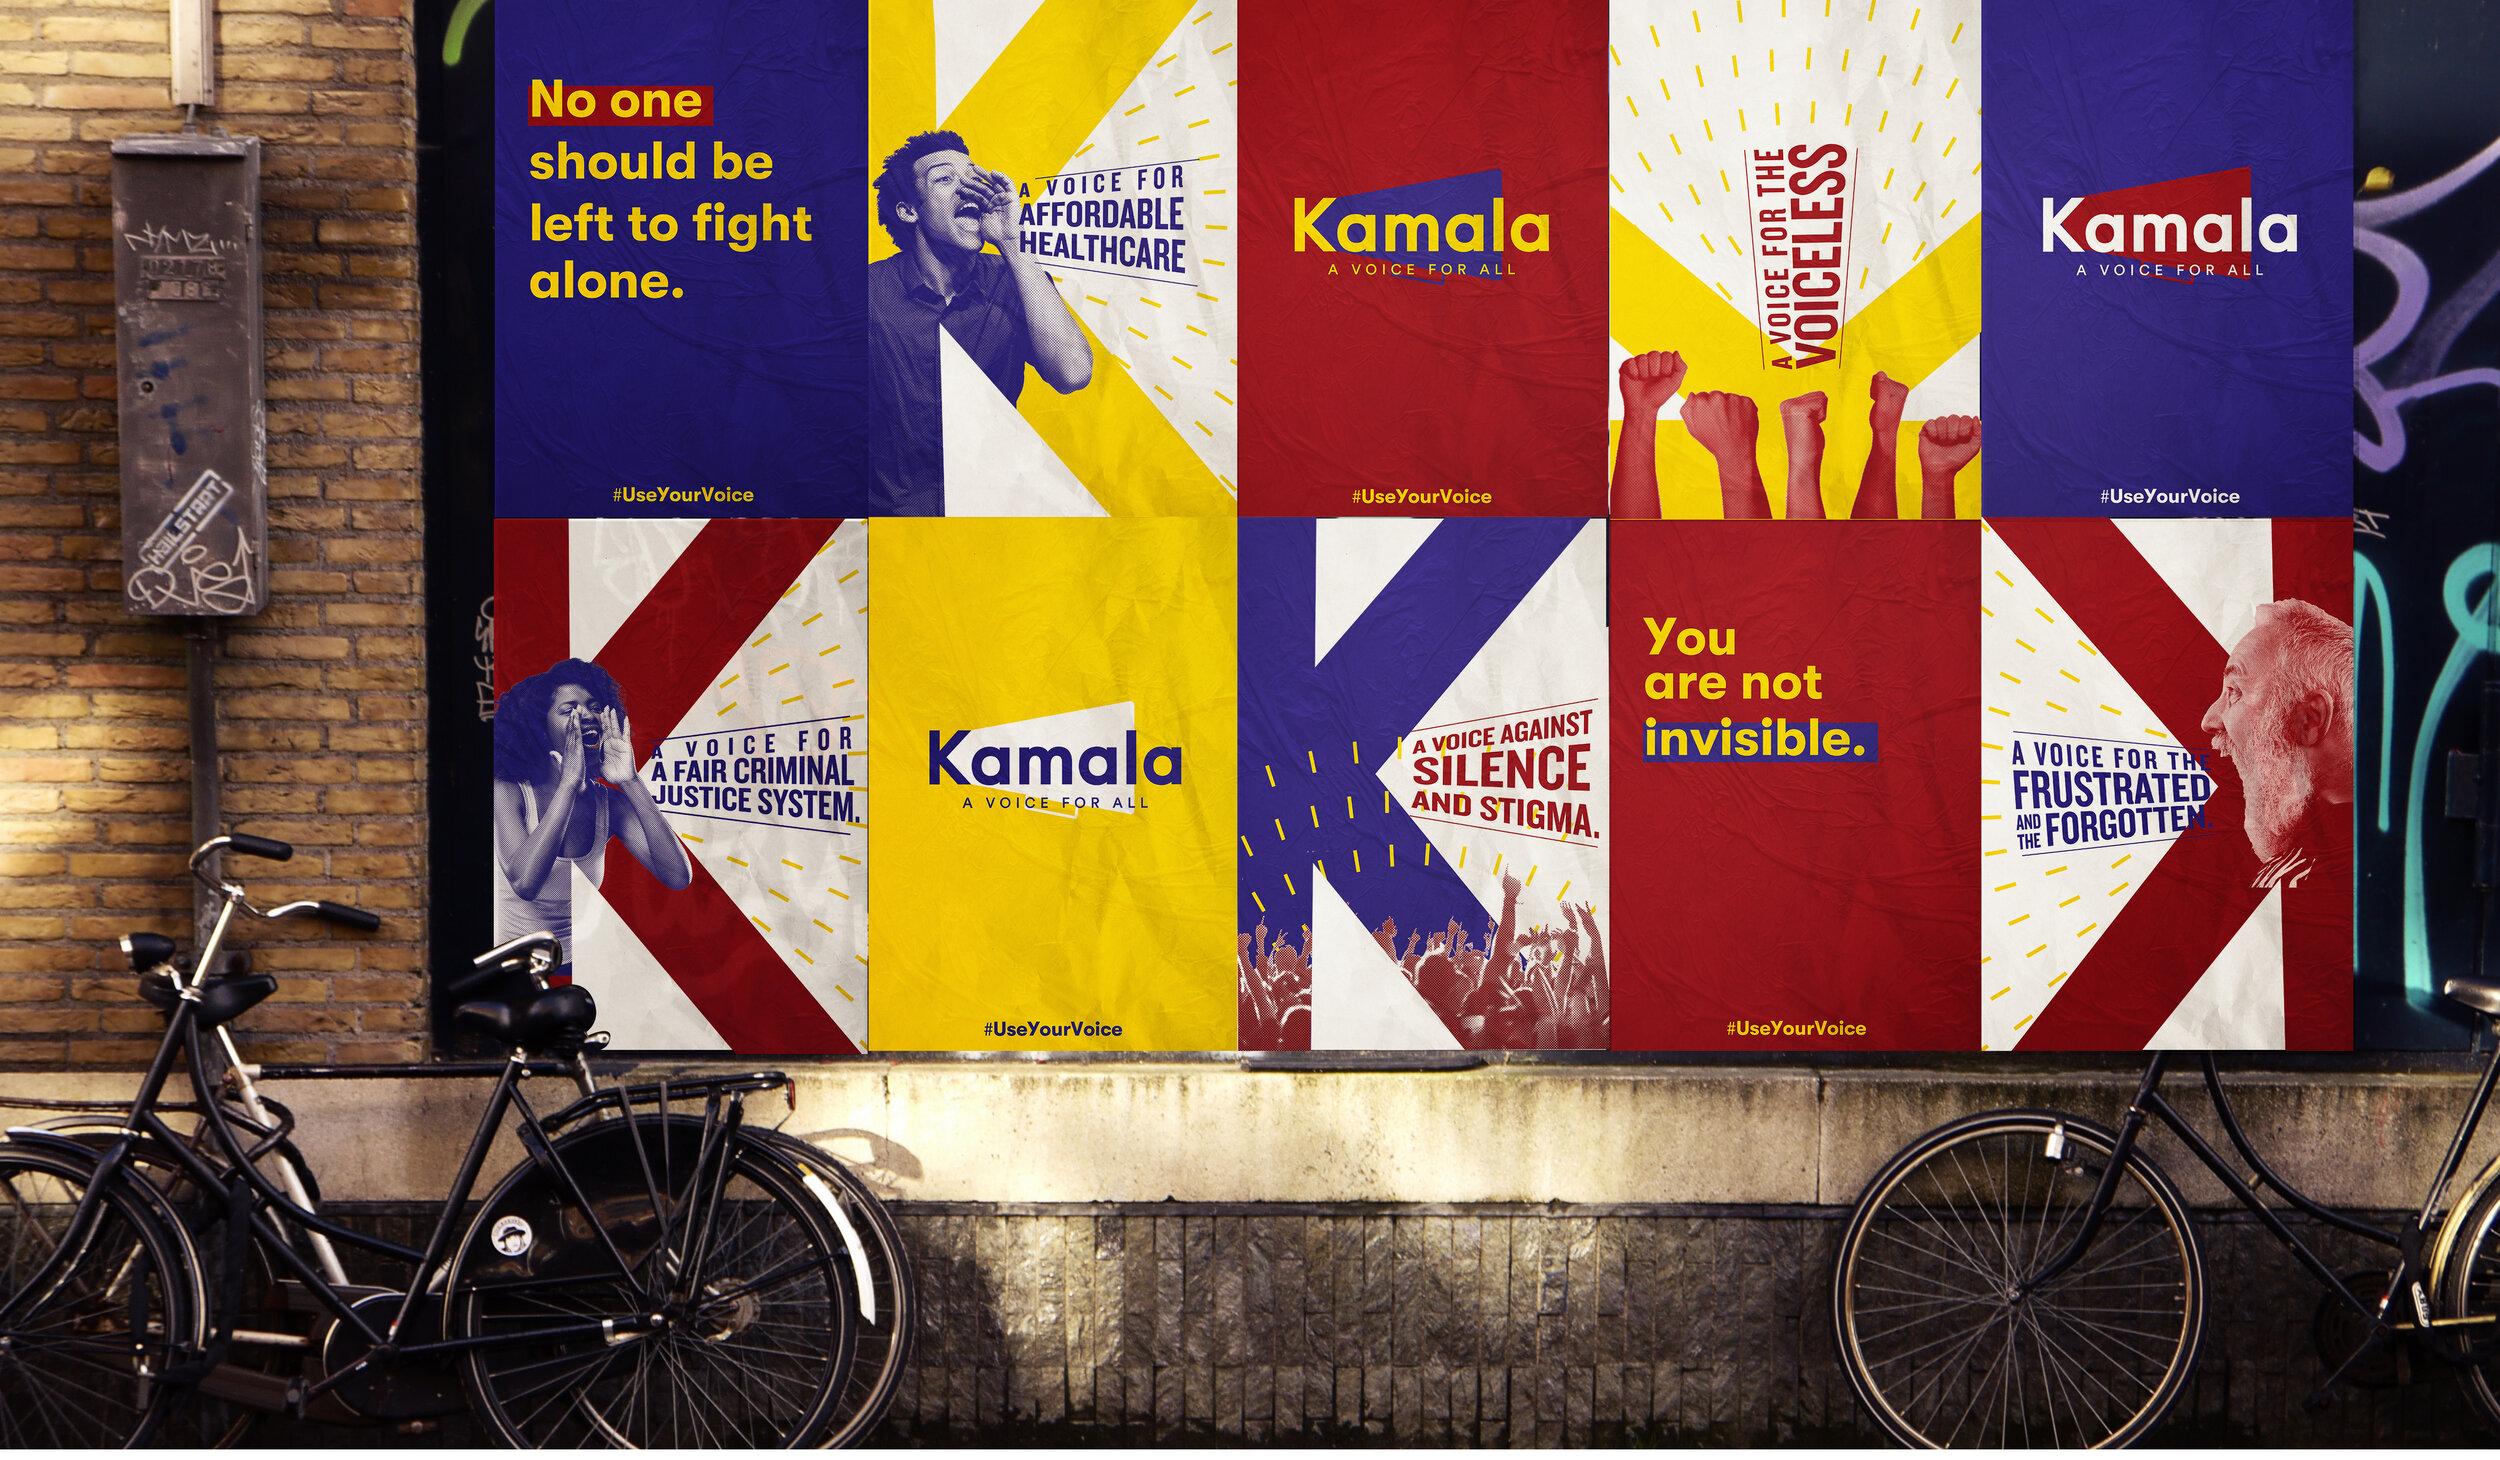 01 Kamala Street posters.jpg